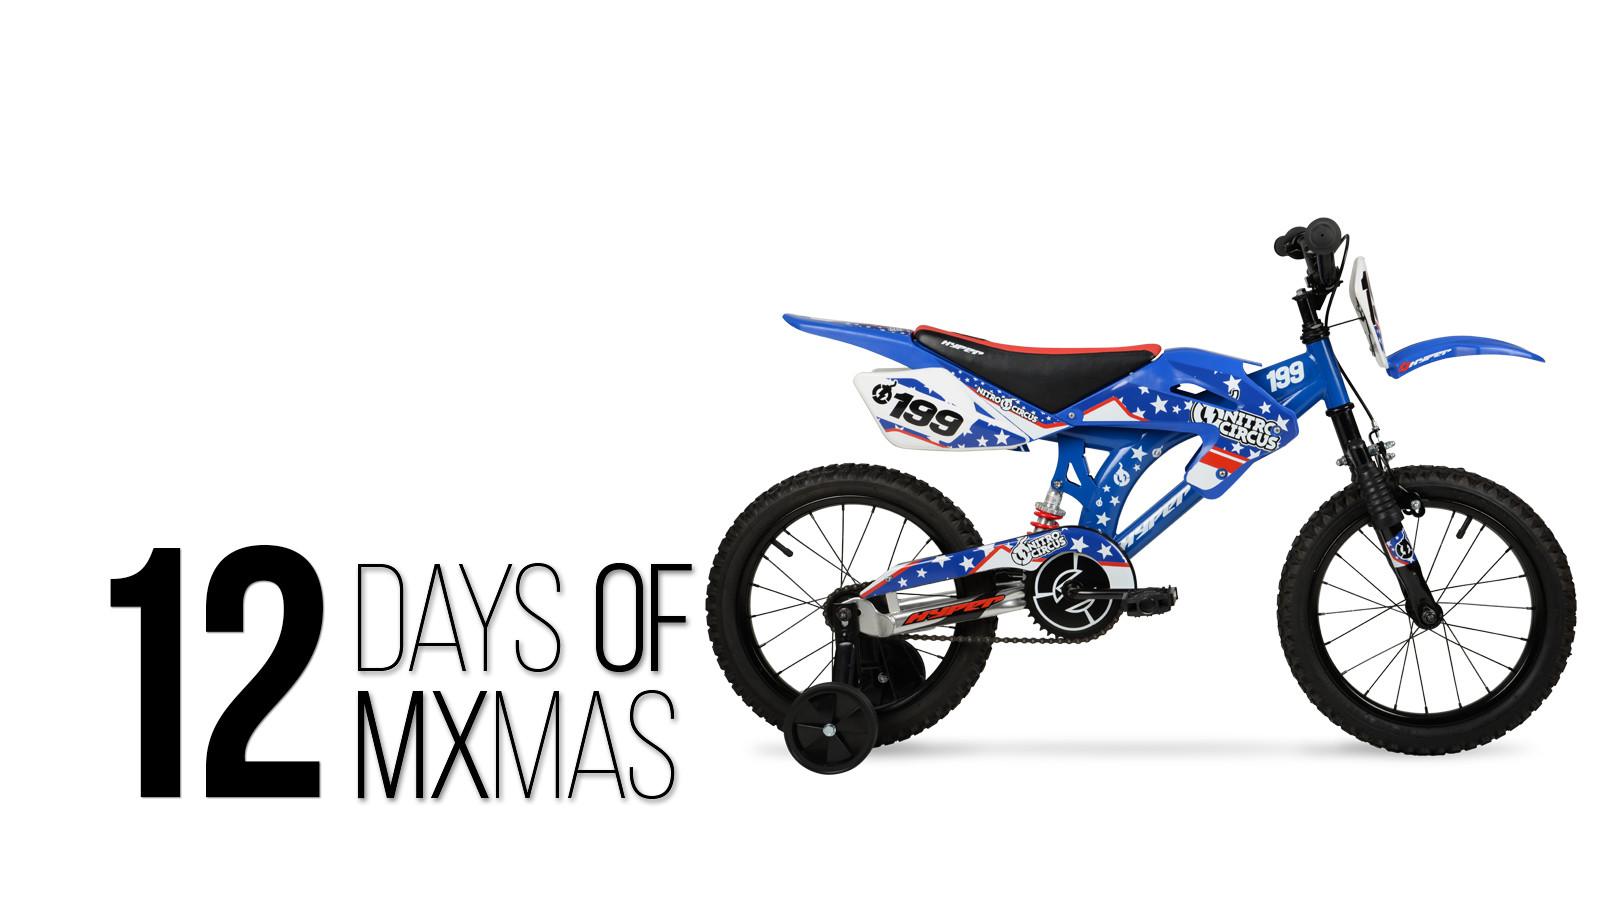 Vital MX 12 Days of MXmas: Day 4